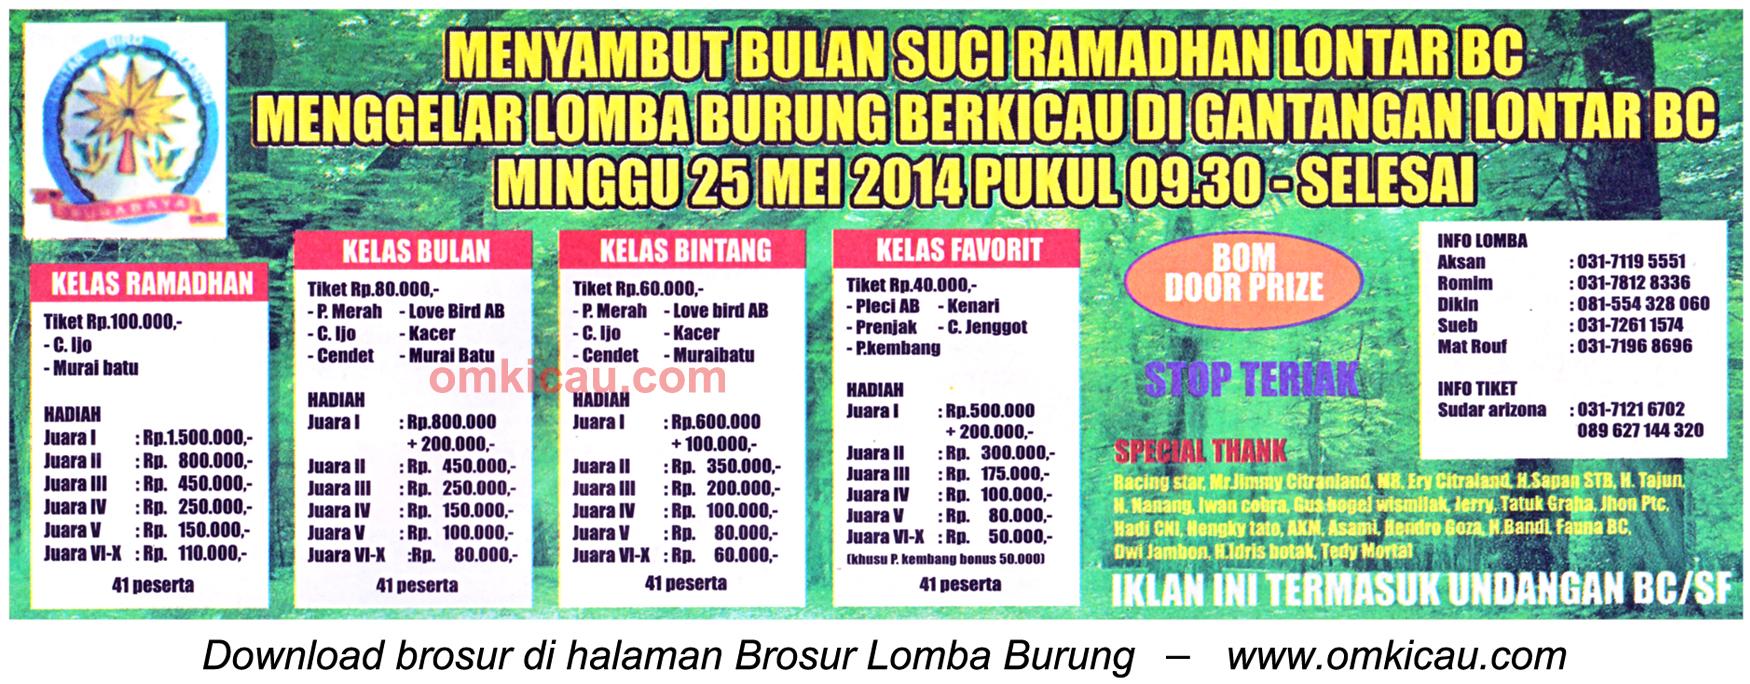 Brosur Lomba Burung Berkicau Lontar BC, Surabaya, 25 Mei 2014